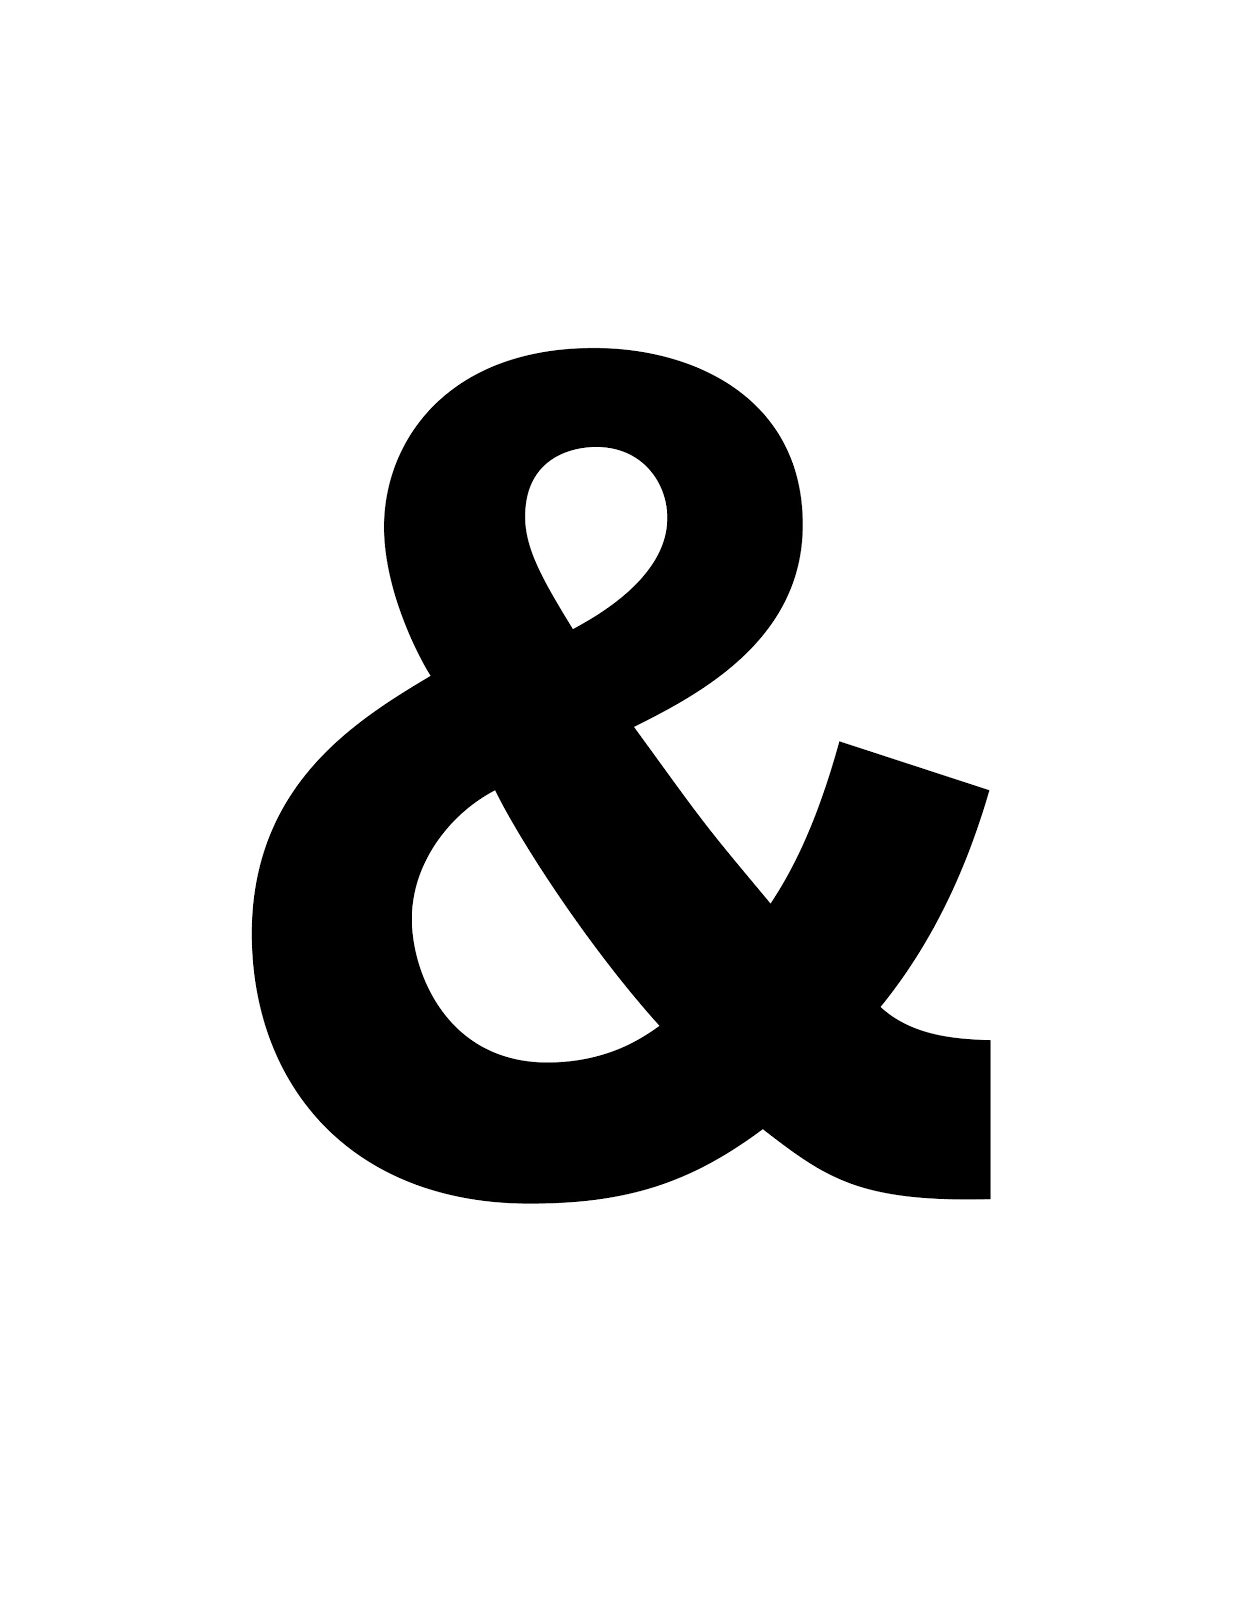 Ampersand ClipArt Best